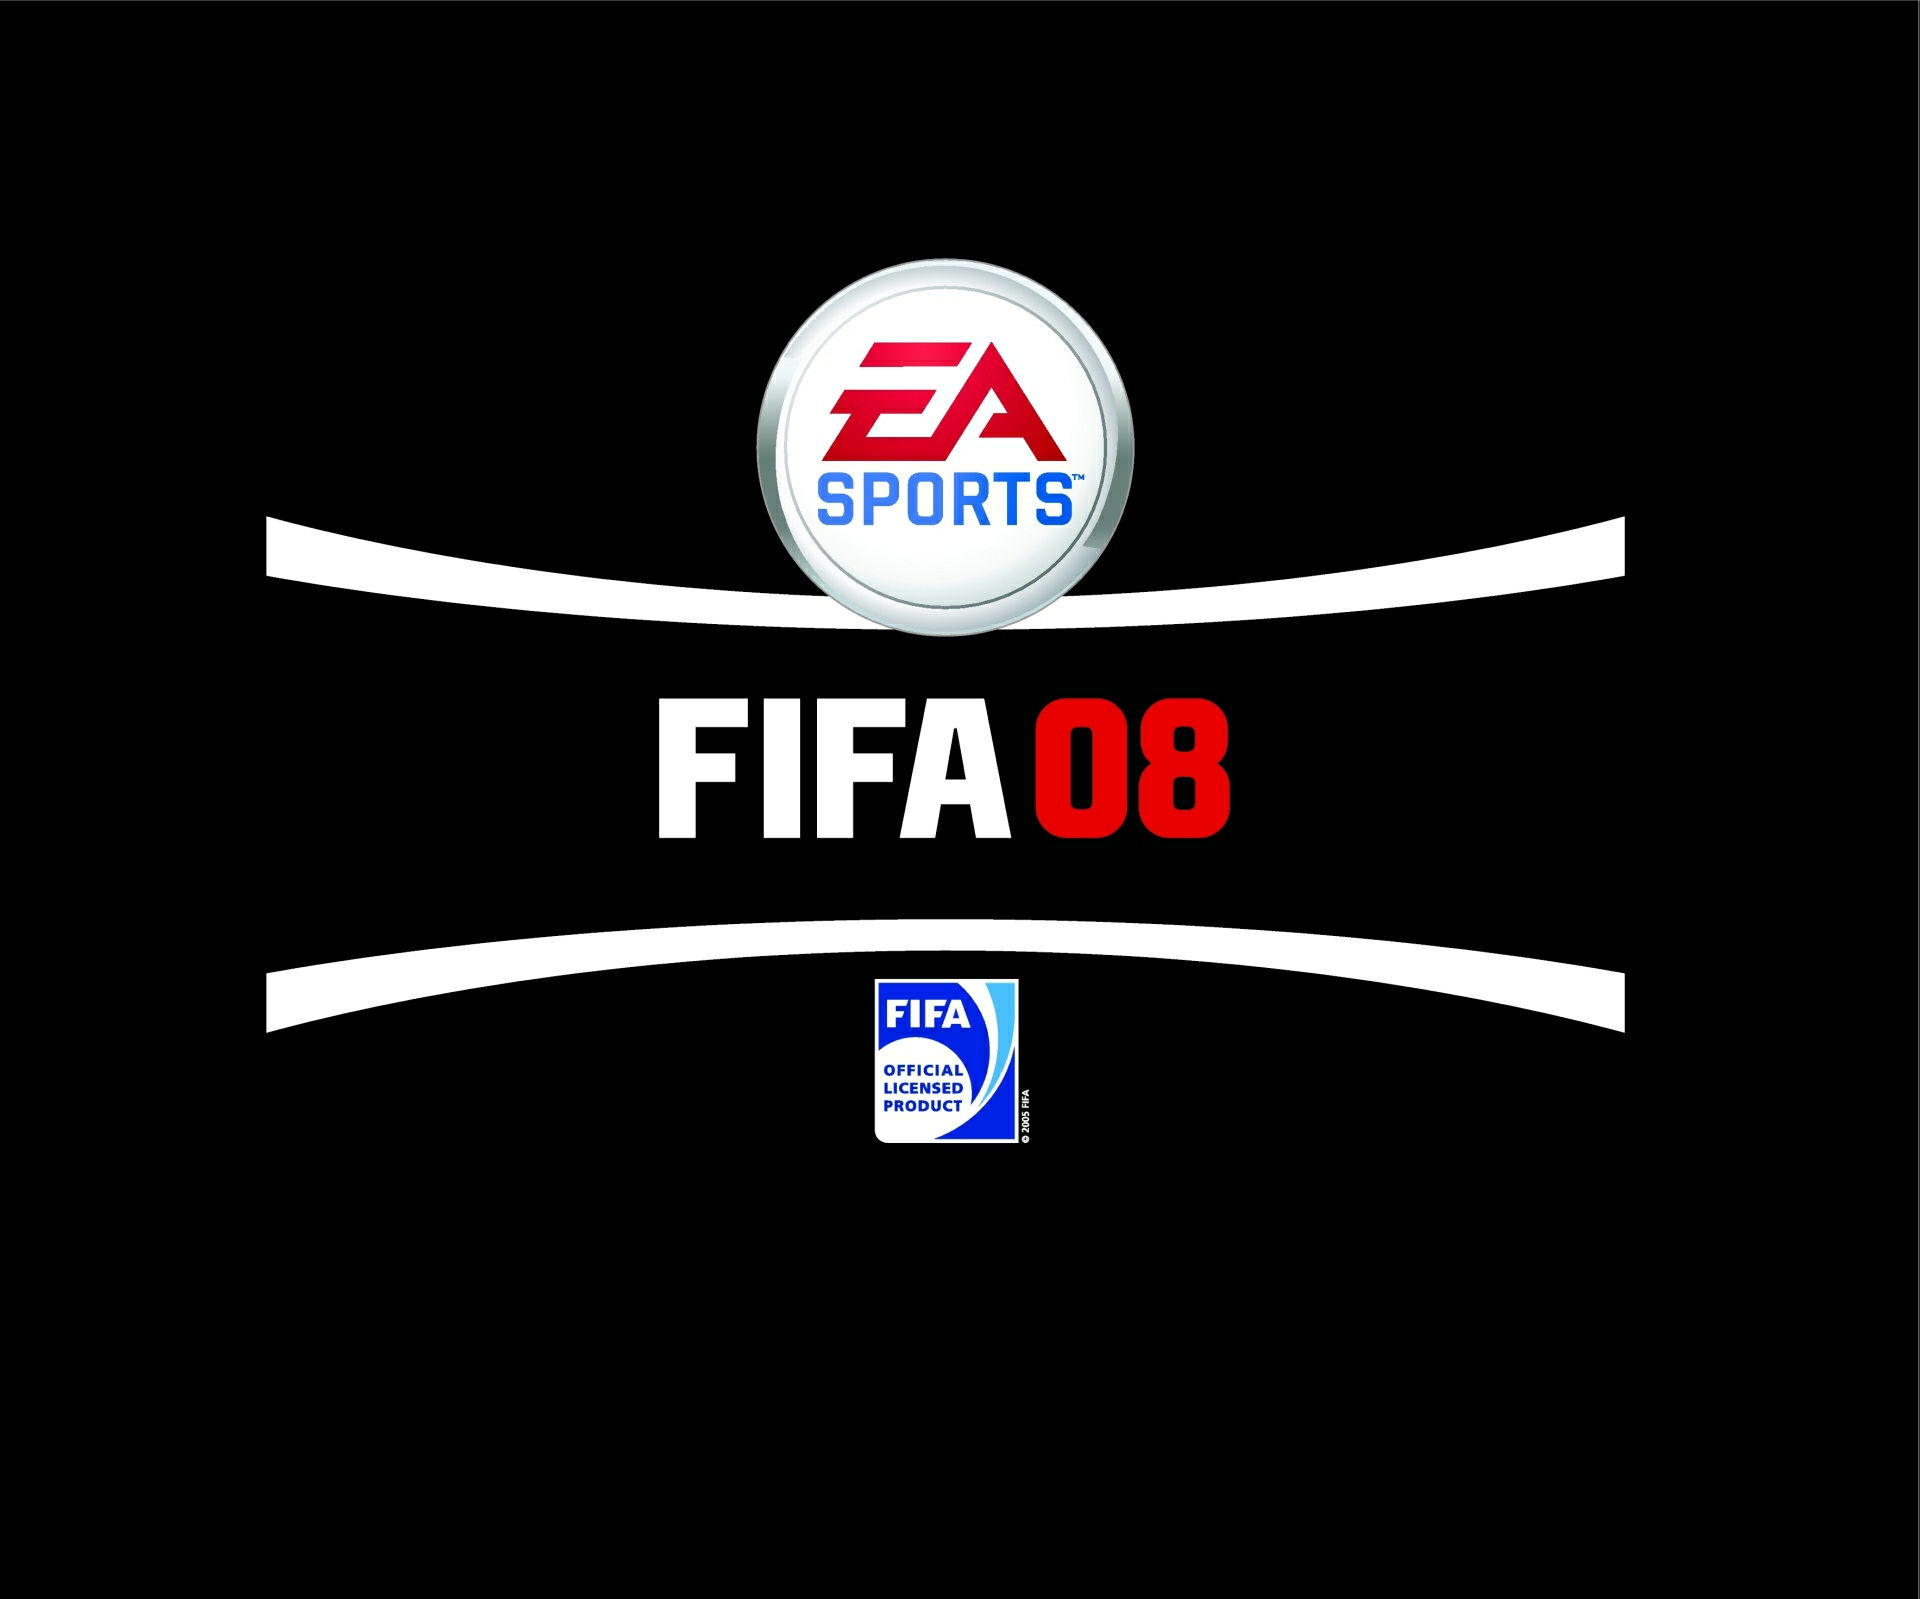 Fifa Logojpg Donald Trump for president 2016